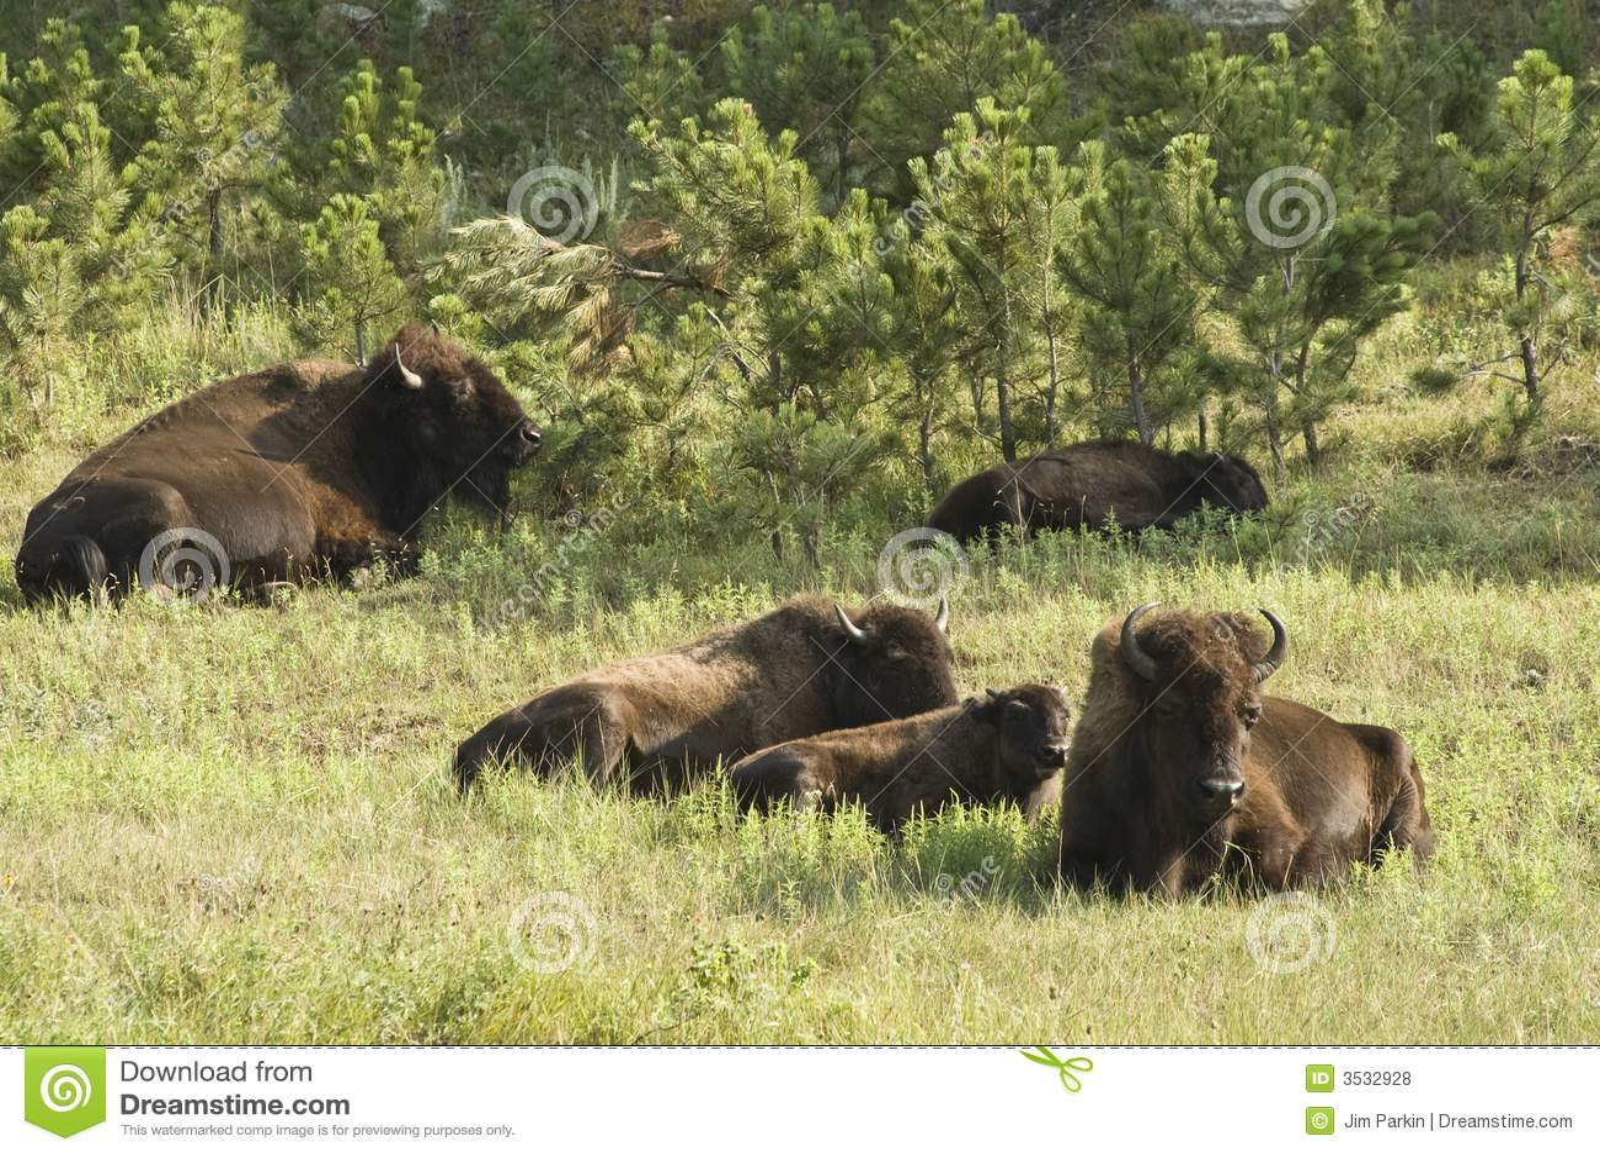 American Buffalo 1